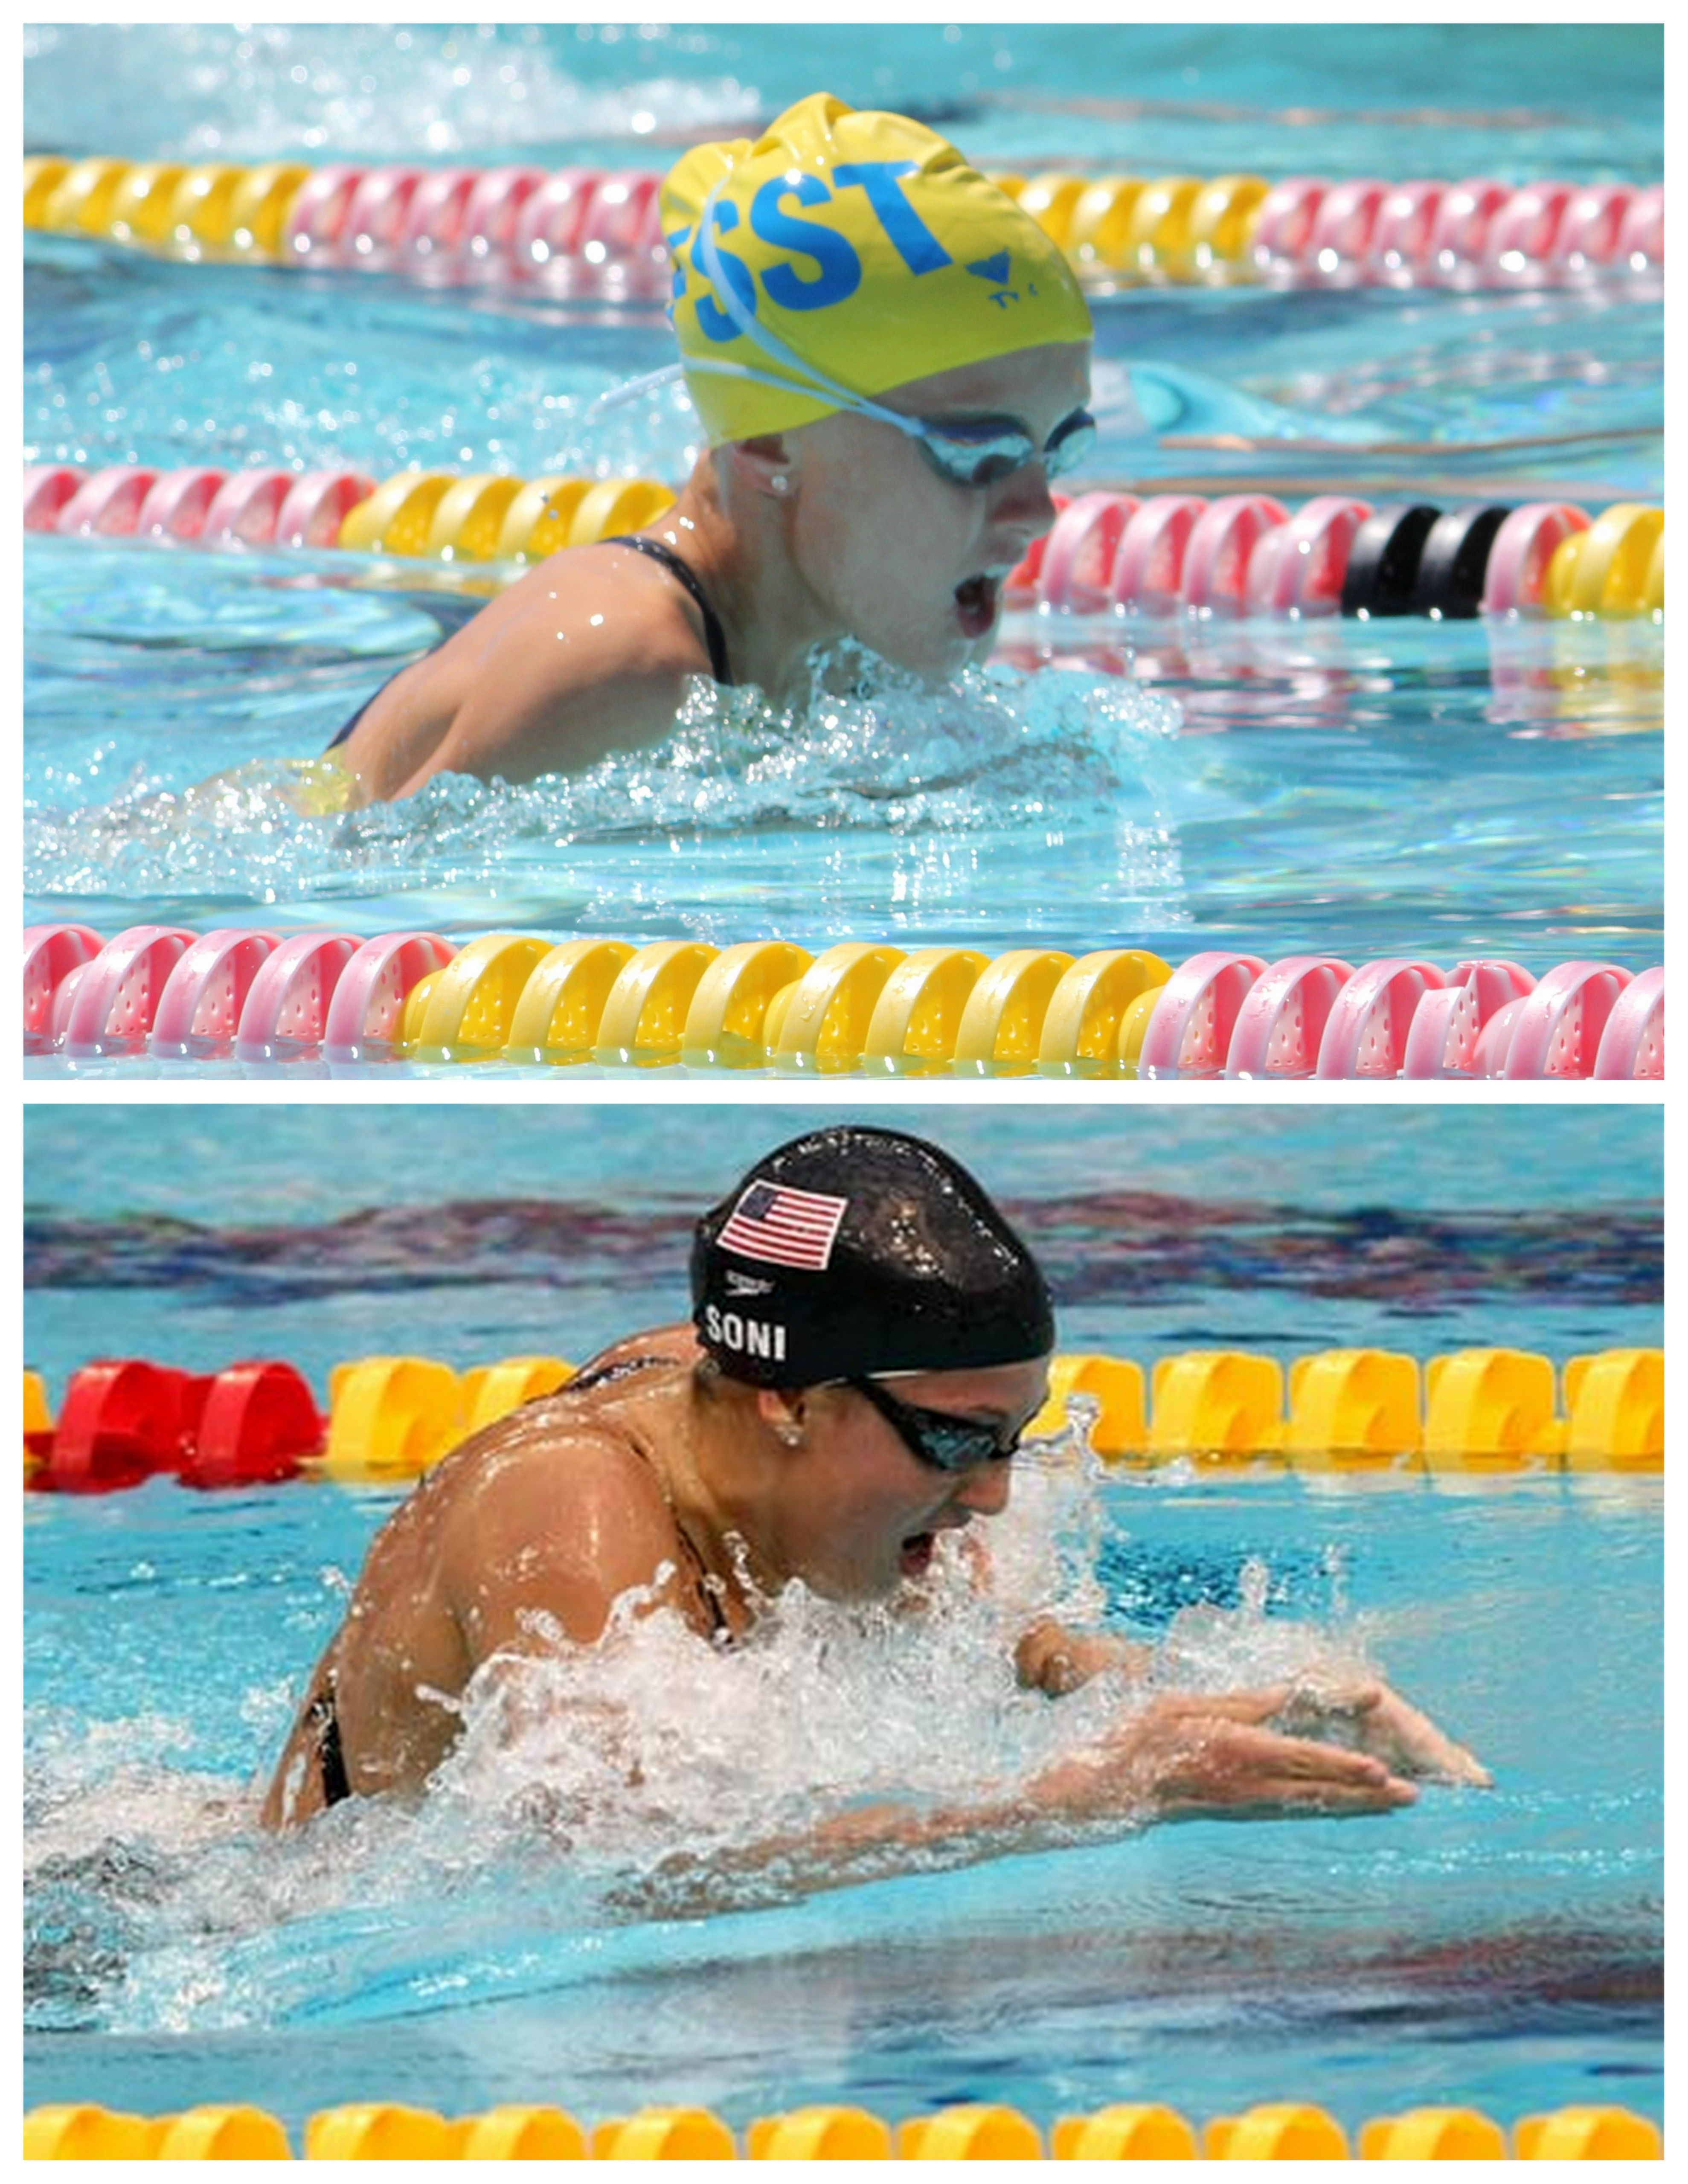 Go Tritions Swimteam Swimming Classes Swim Life Swim School